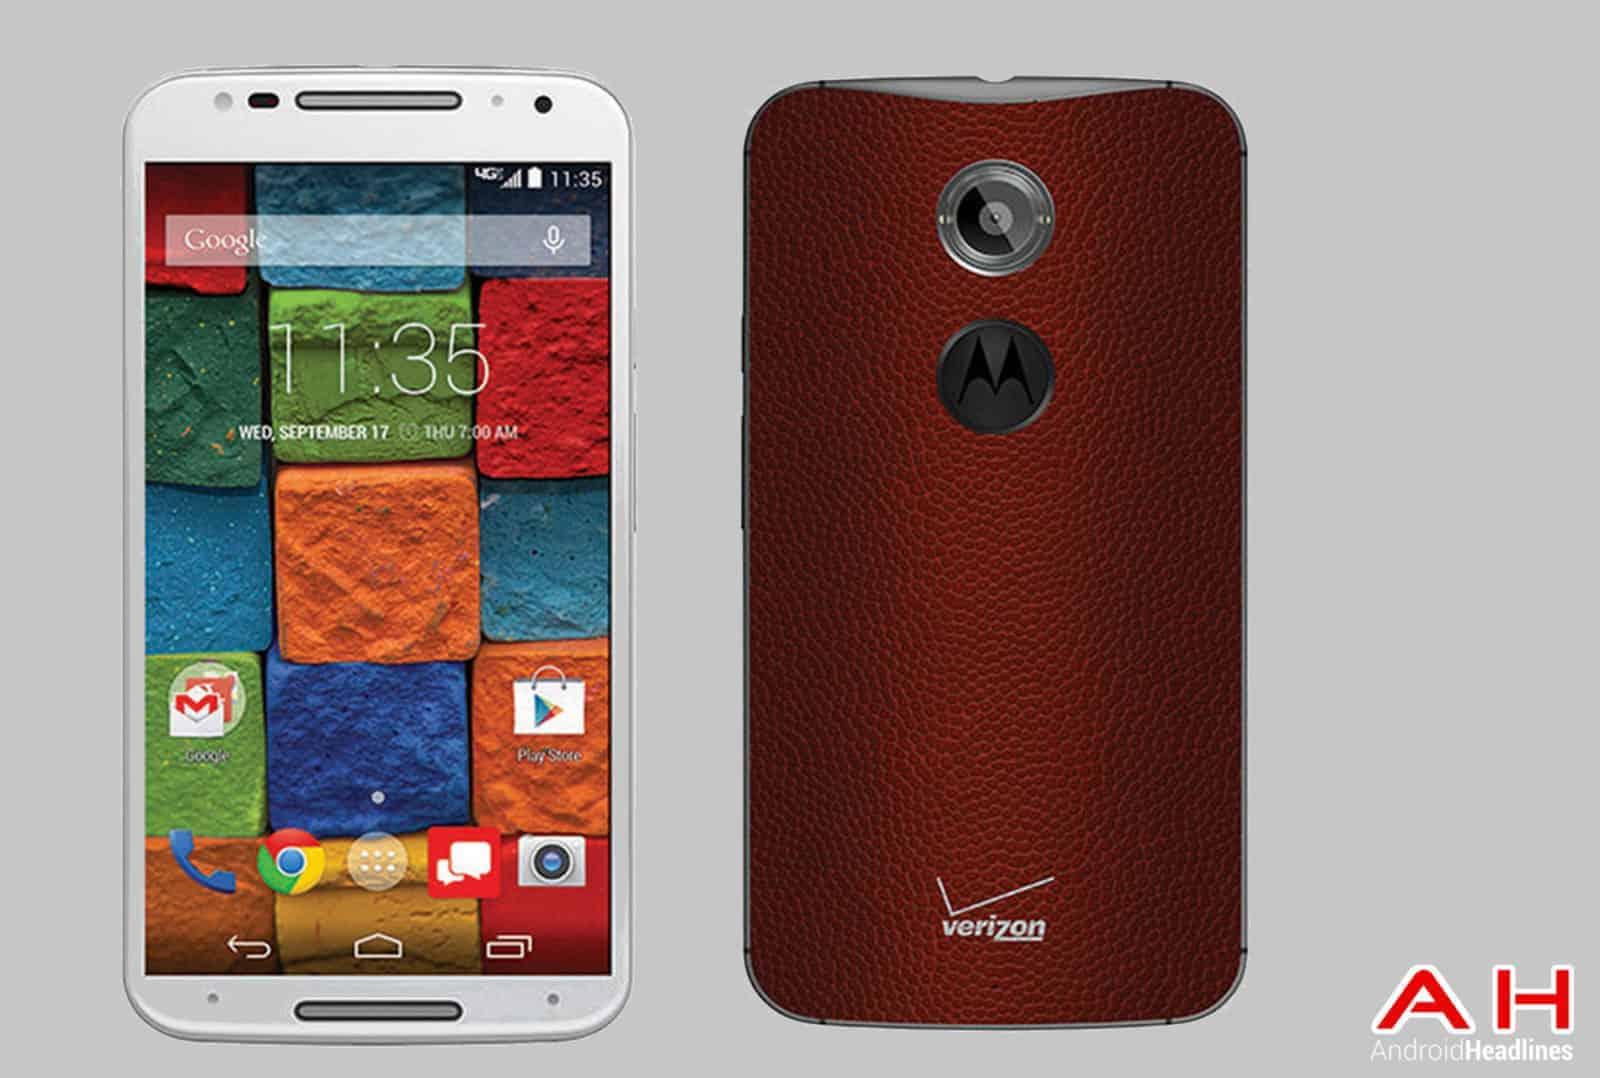 Moto X Verizon Football Exclusive cam AH